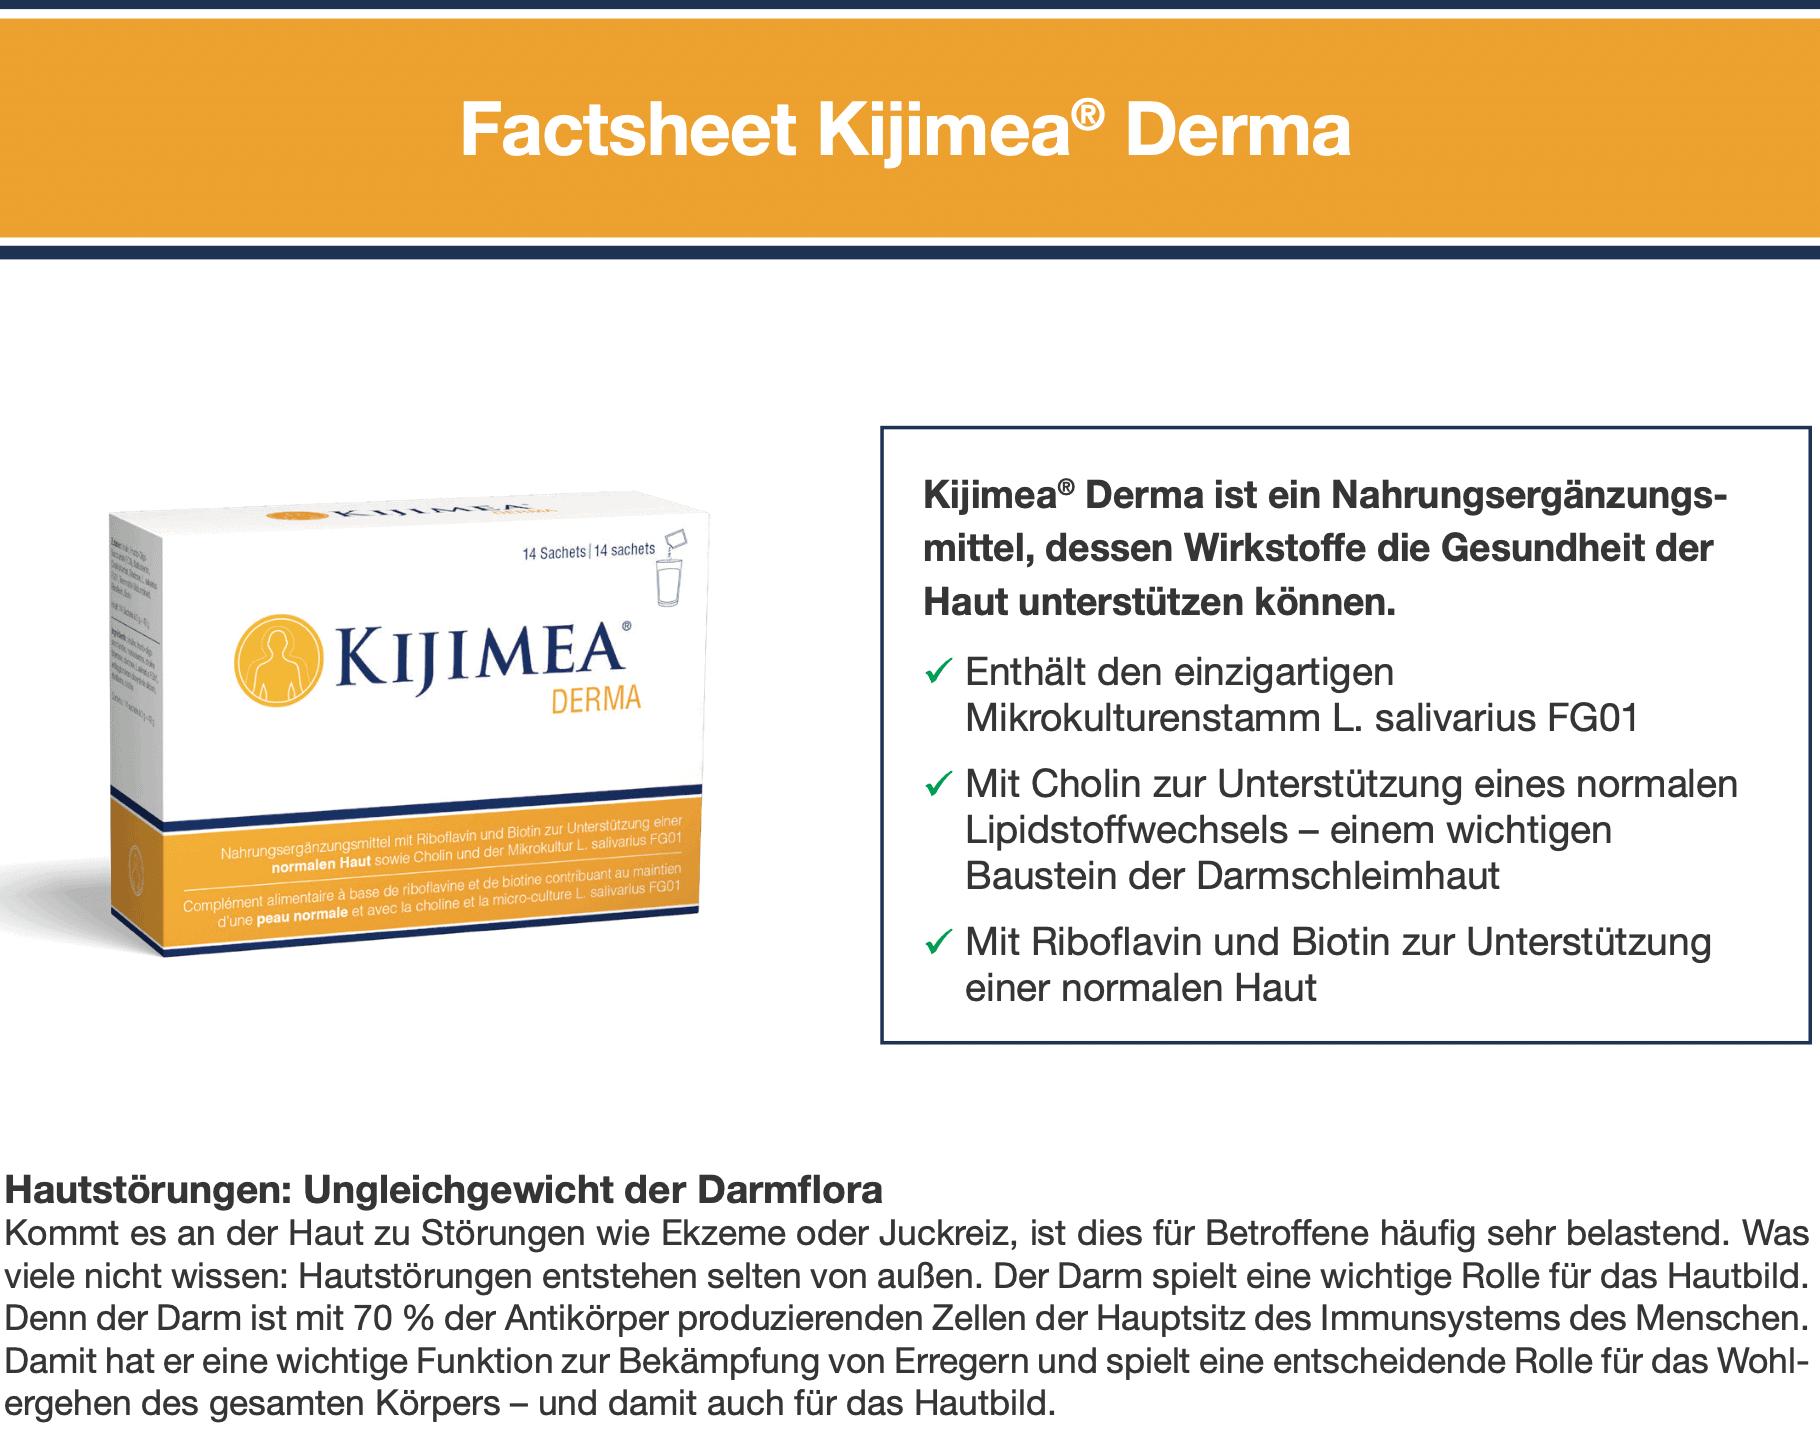 Factsheet Kijimea Derma